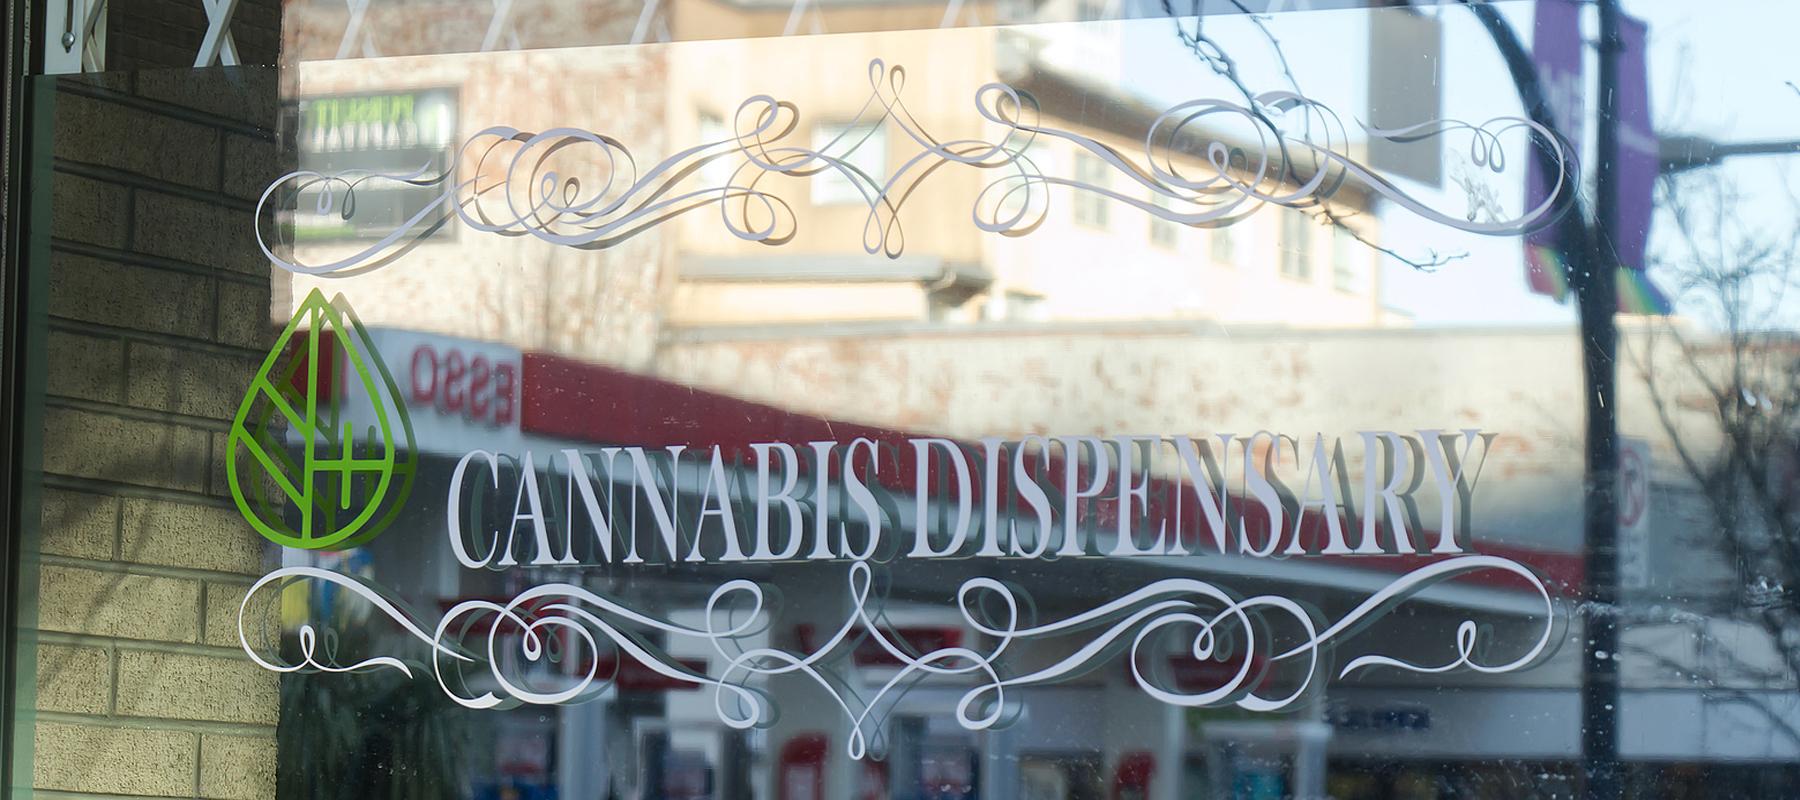 Cannabis dispensary sign on retail window